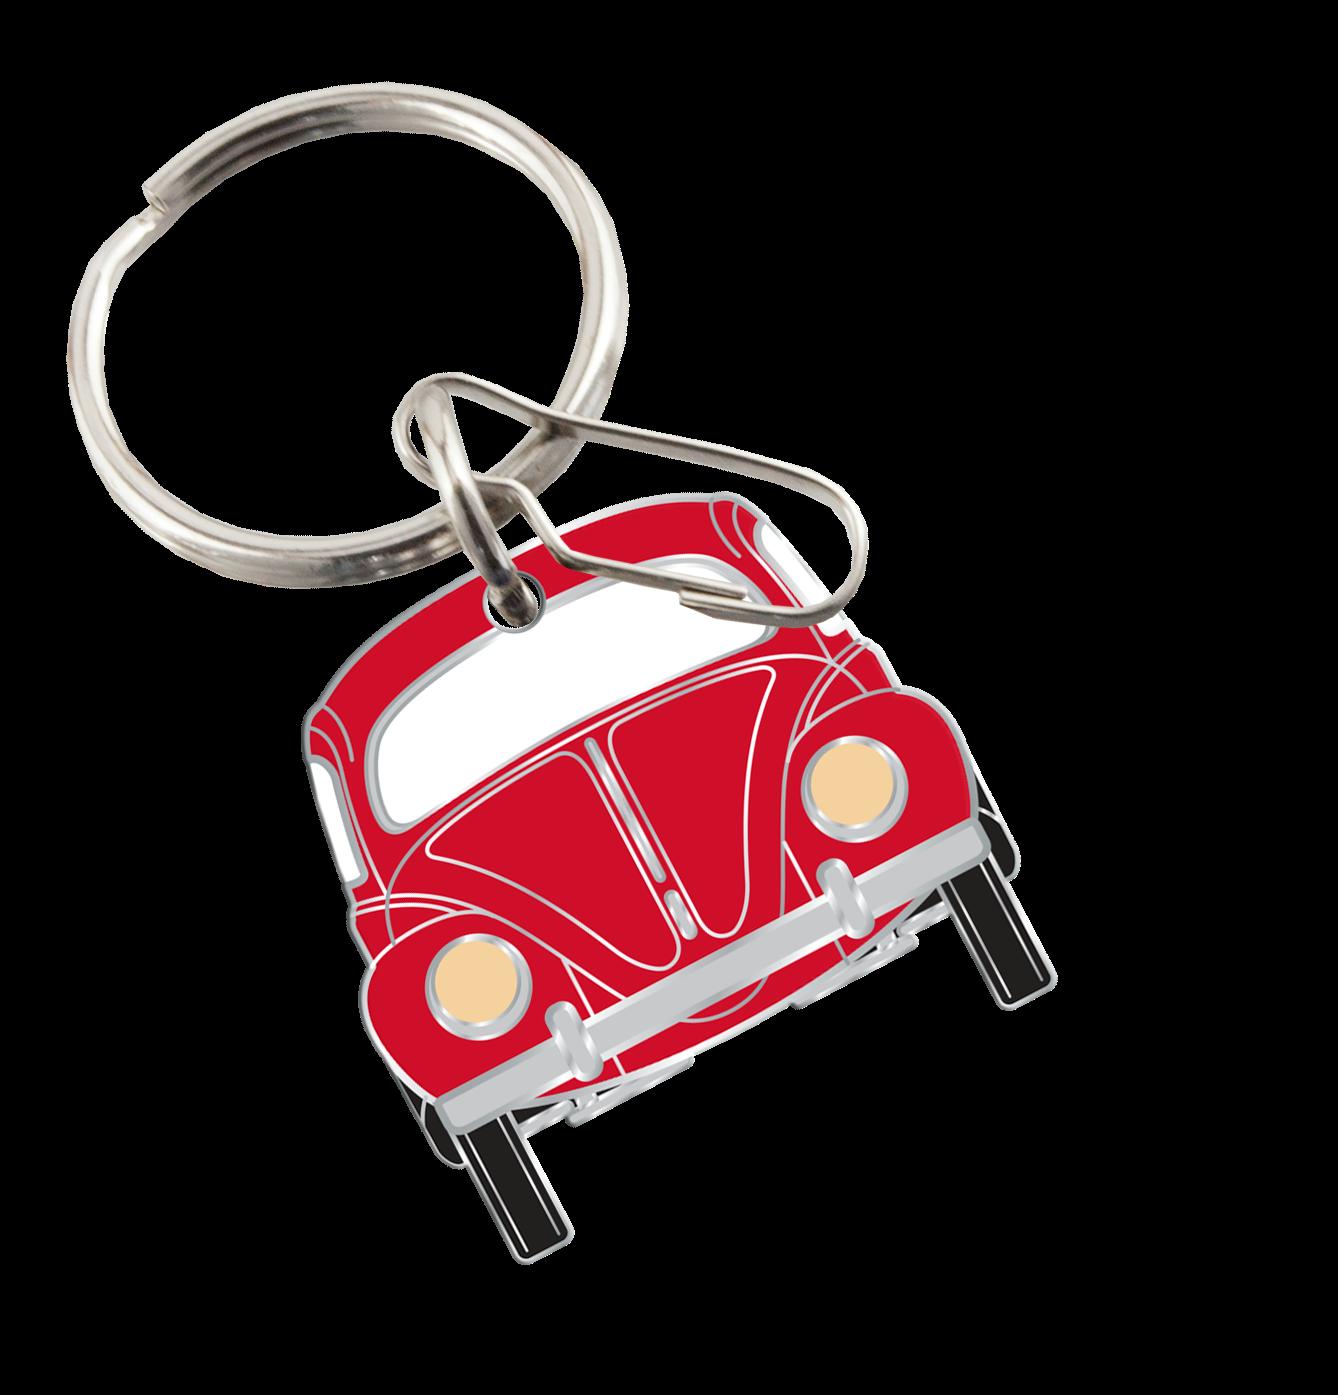 My Cool Car Stuff Volkswagen Classic Bug Enamel Key Chain